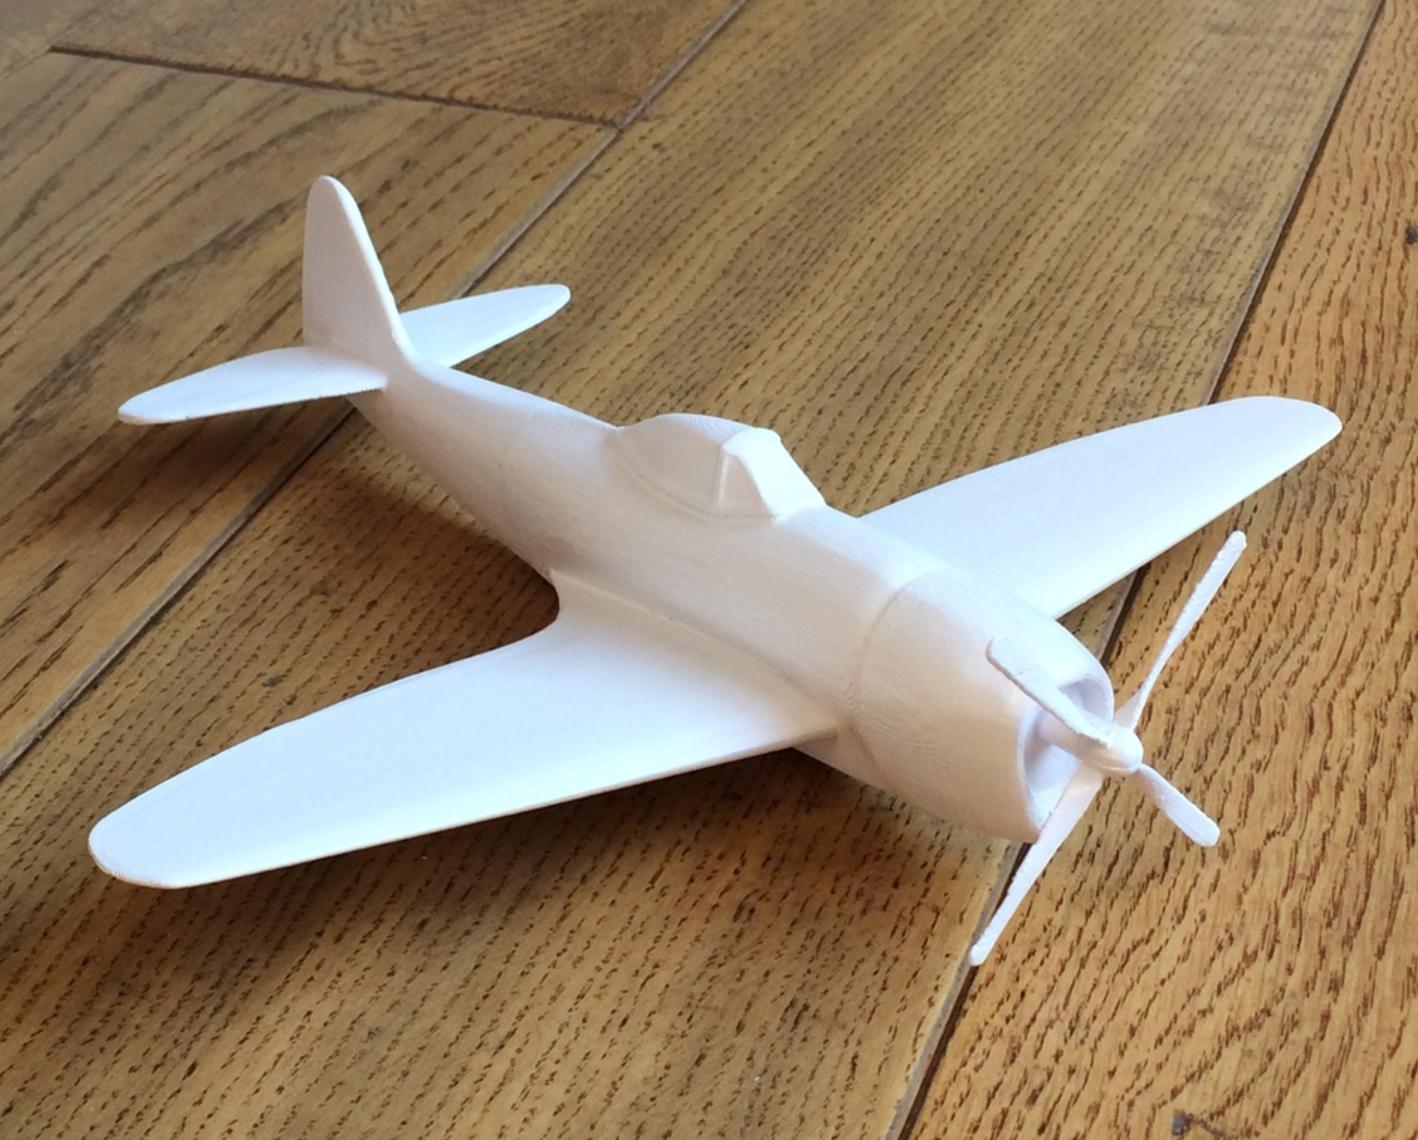 Capture d'écran 2017-03-22 à 16.21.33.png Download free STL file P-47 Thunderbolt • 3D printing design, Roger